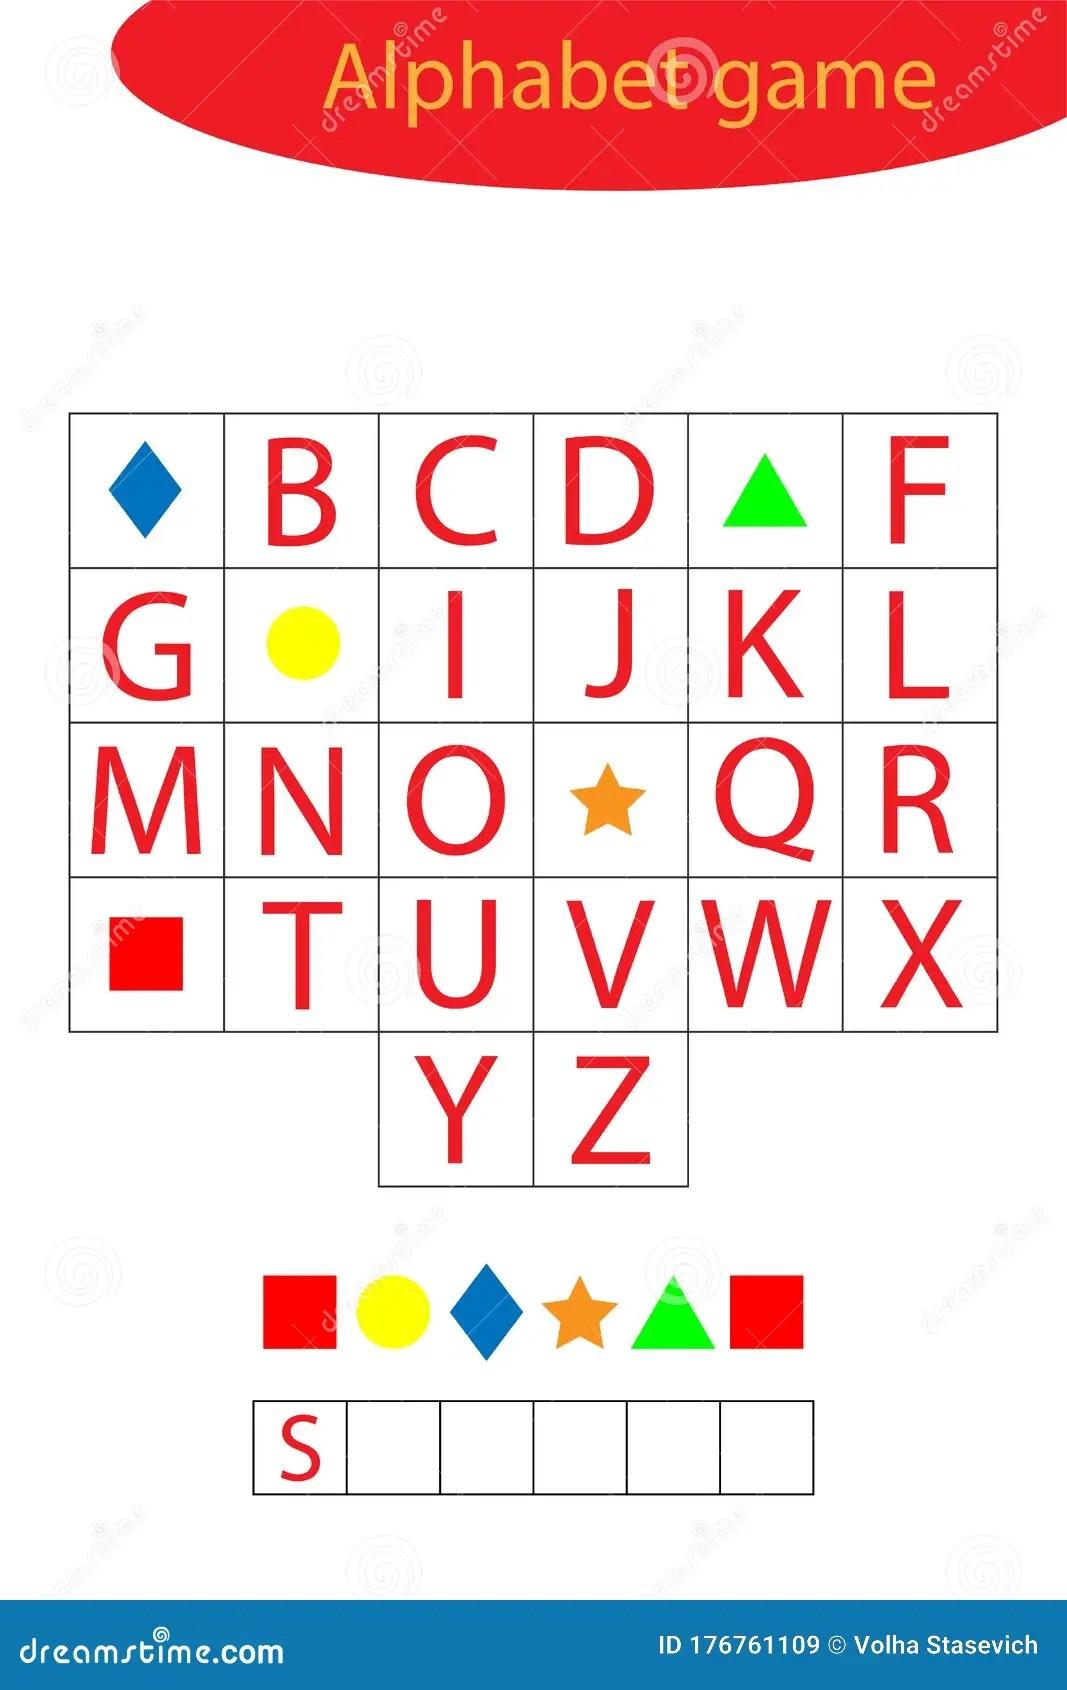 Shapes Alphabet Game For Children Make A Word Preschool